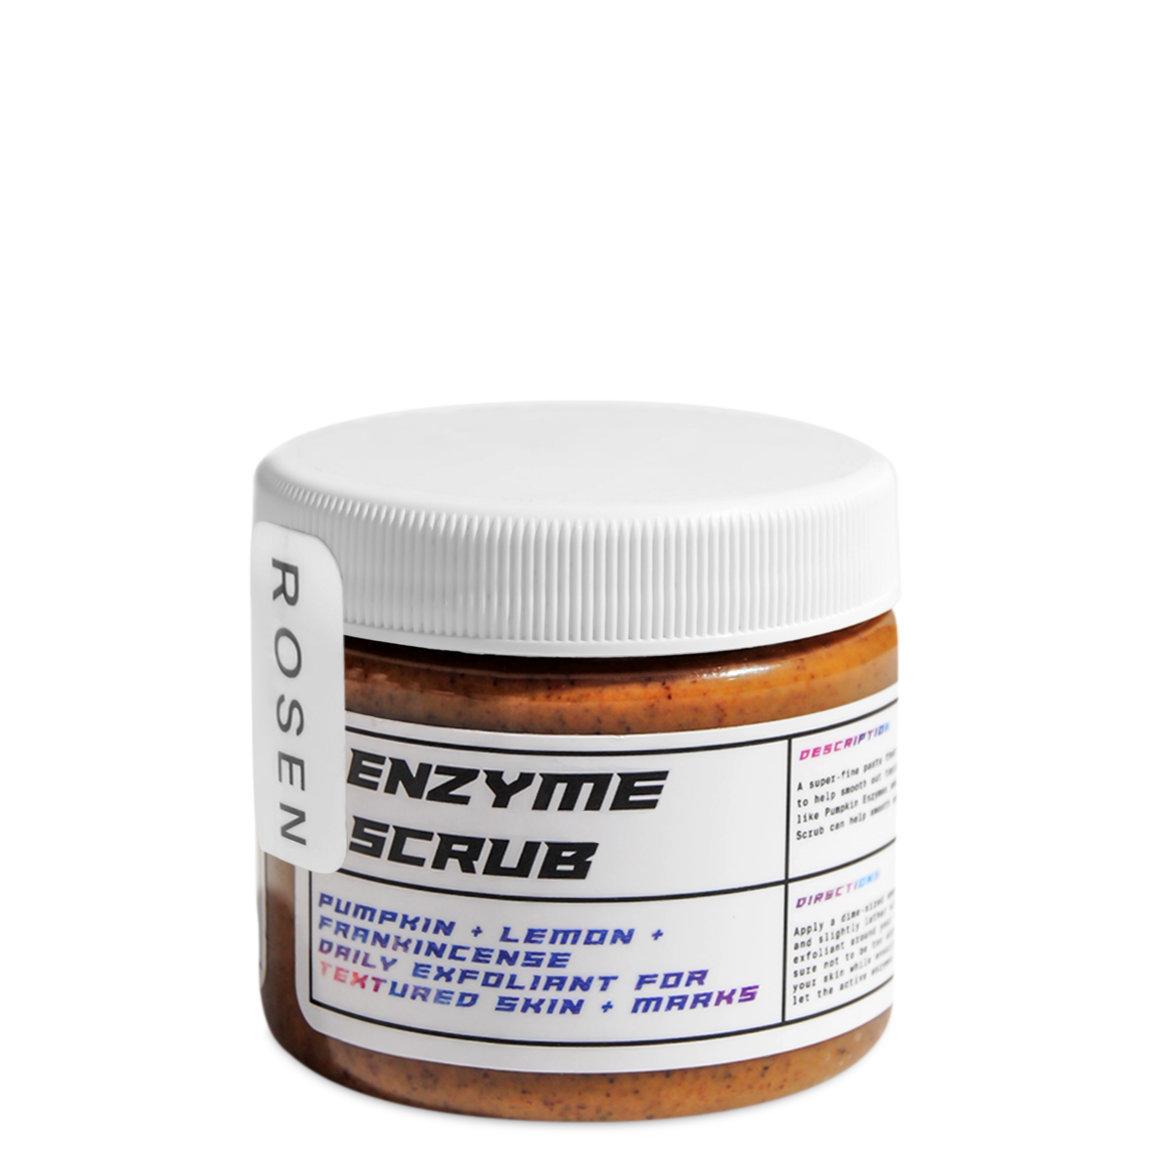 ROSEN Skincare Enzyme Scrub alternative view 1 - product swatch.